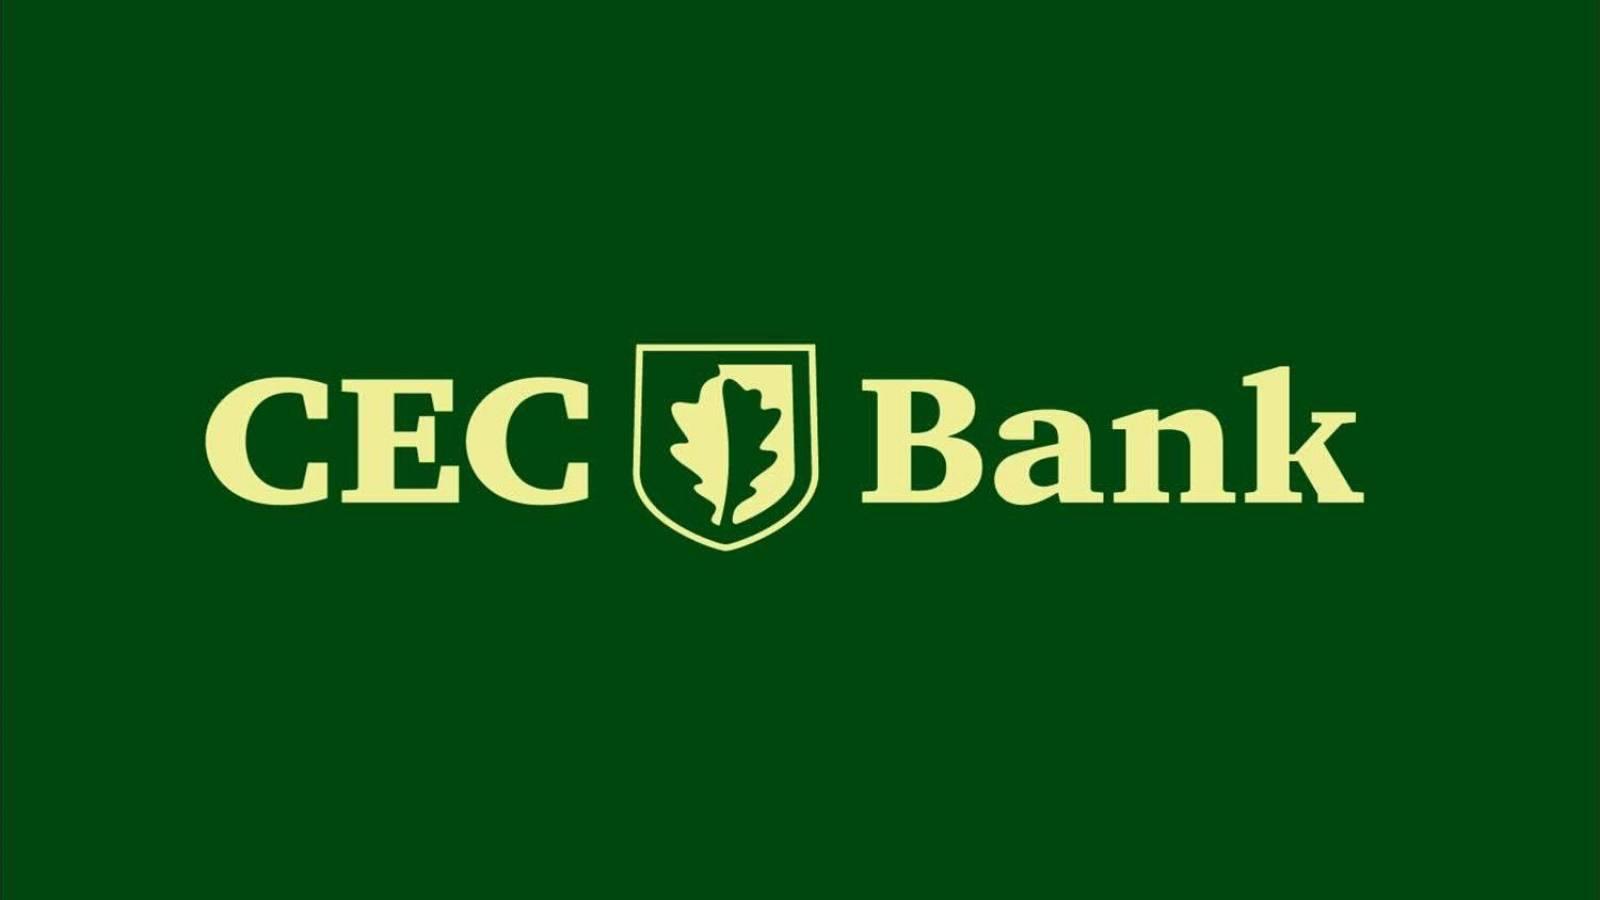 CEC Bank parteneriat